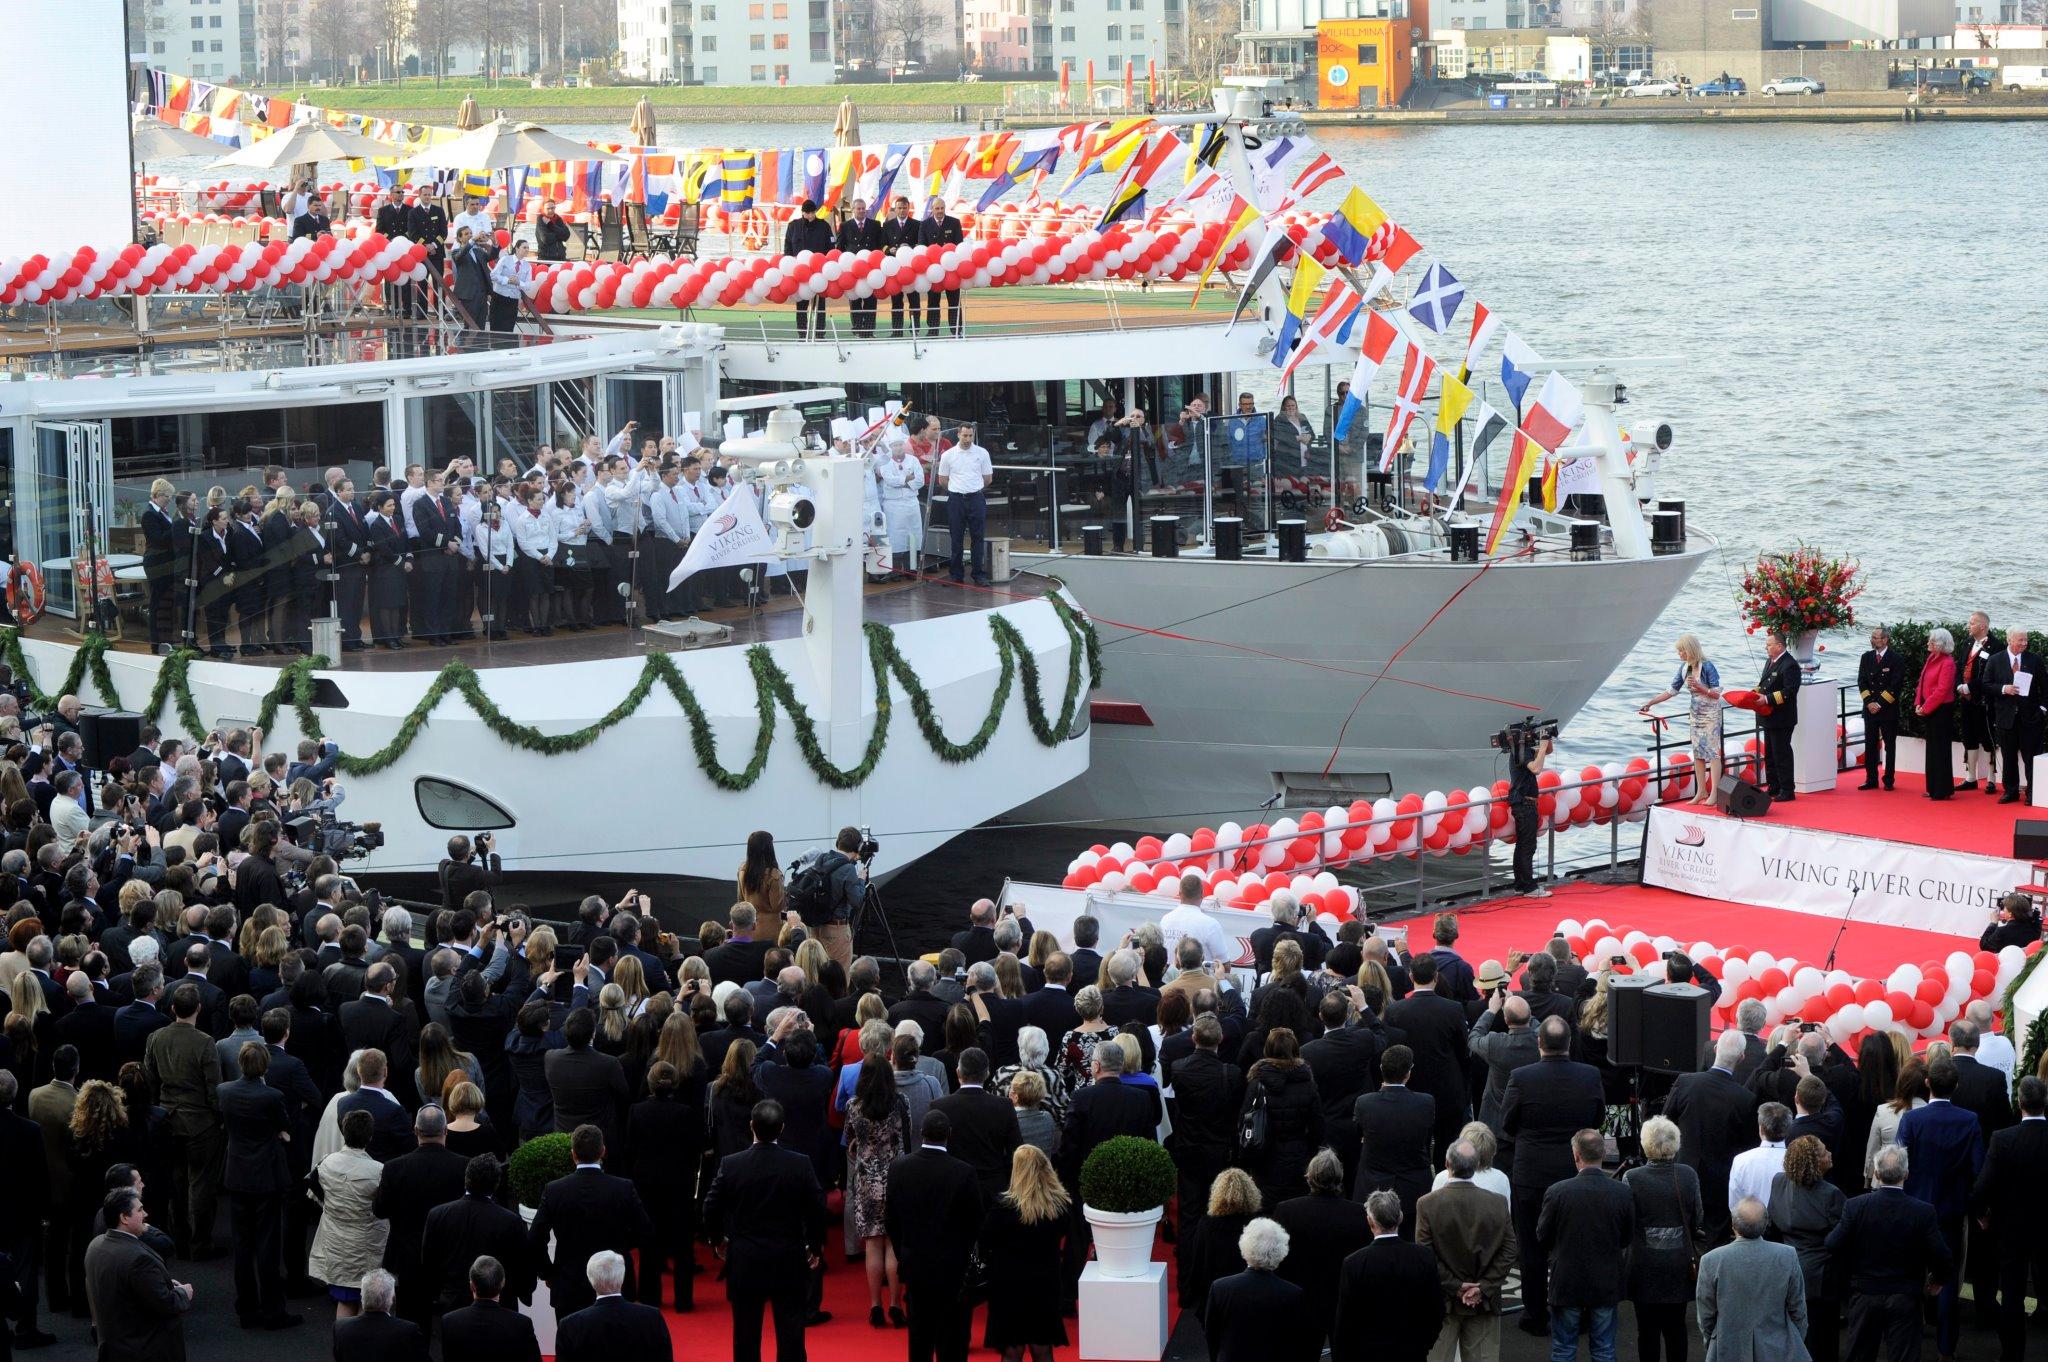 Viking Cruises 2012